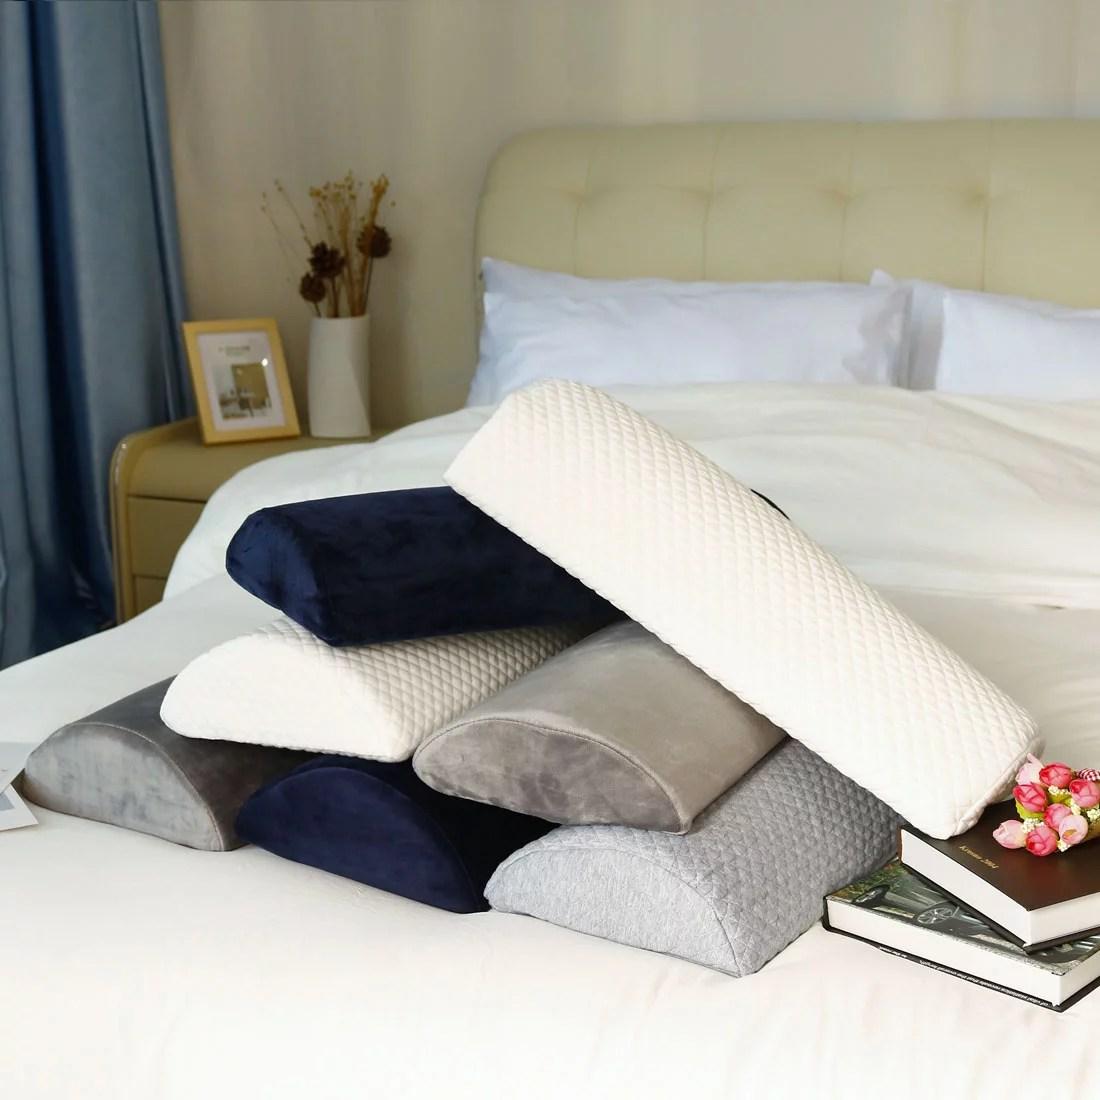 memory foam roll body pillow bolster semi roll neck back leg knee with fleece cover half moon